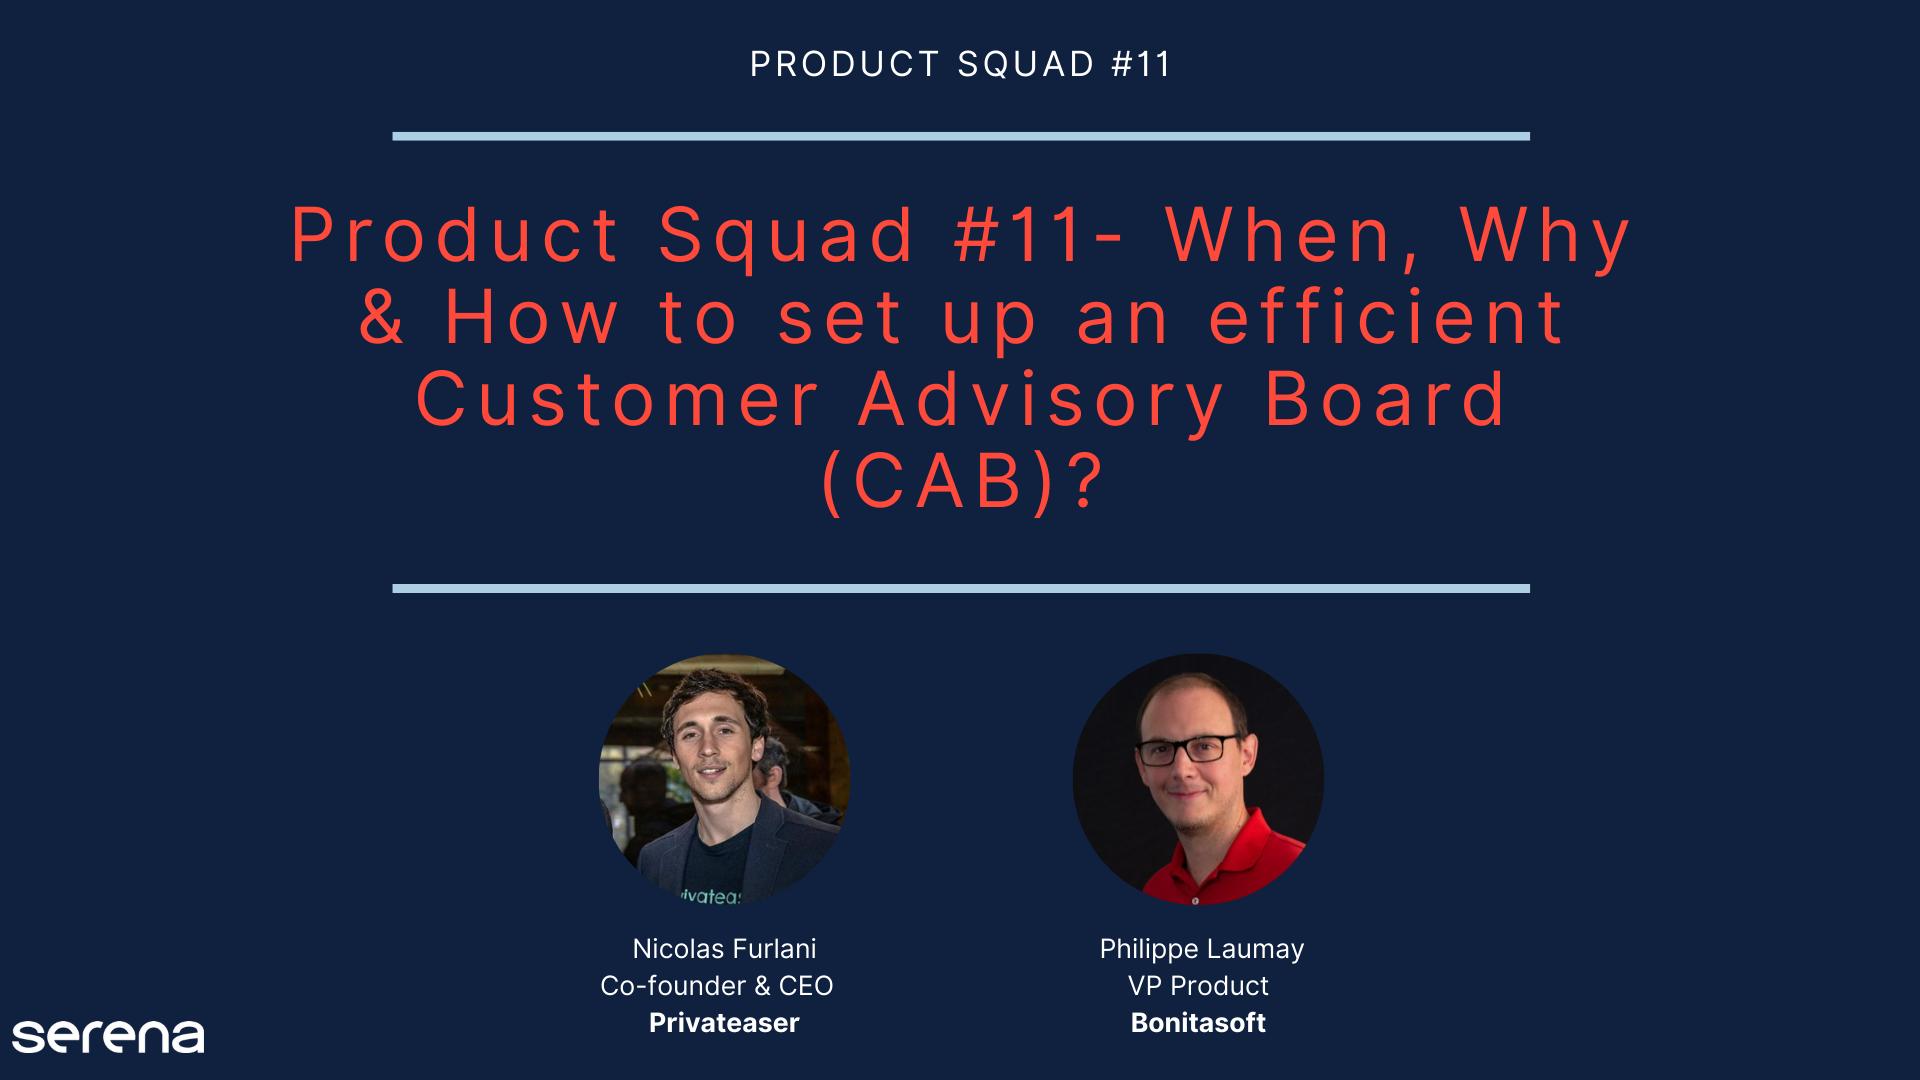 Product Squad #11